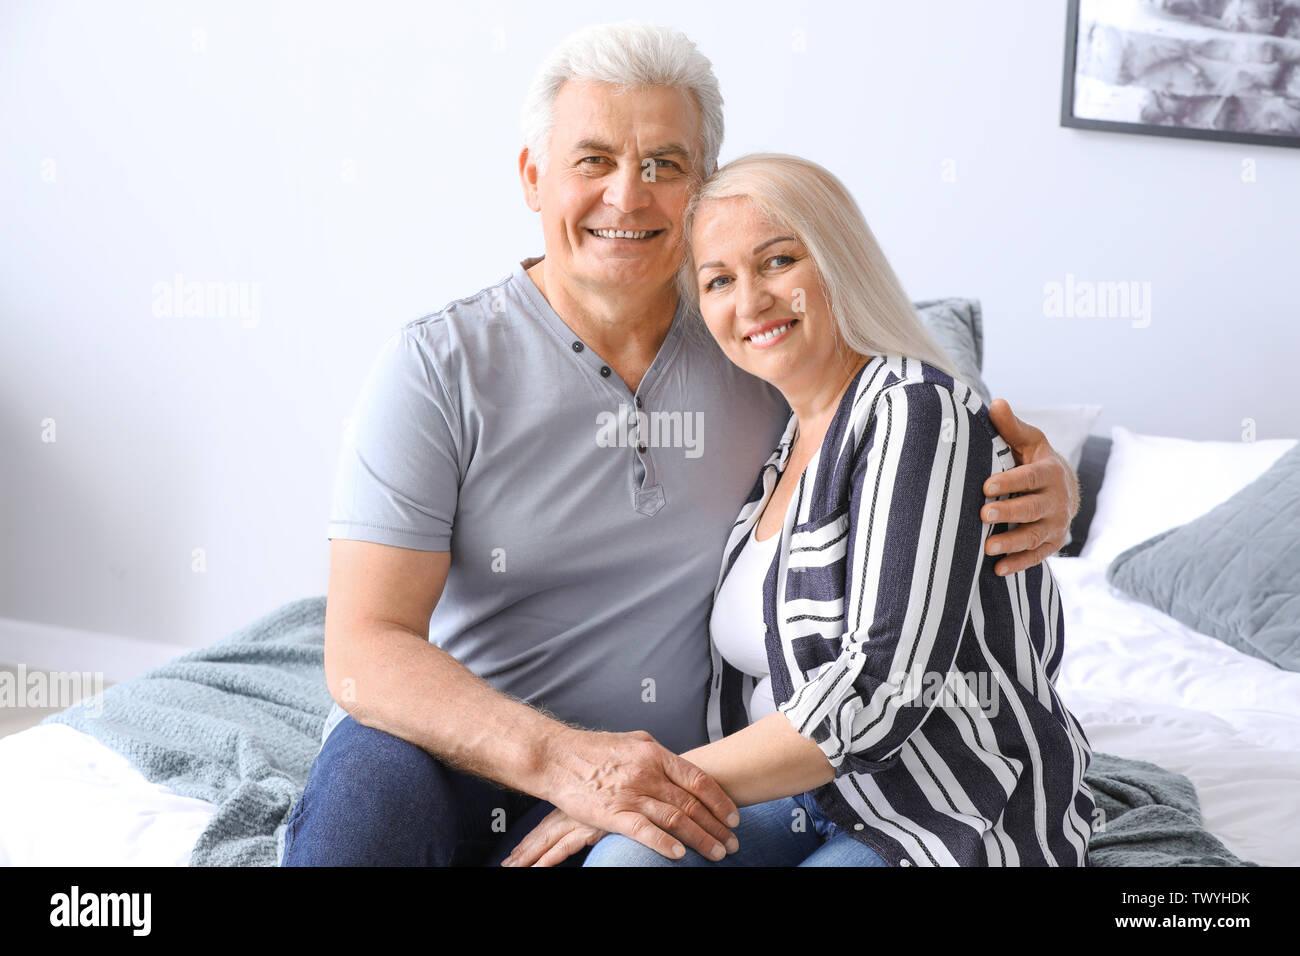 Portrait of happy mature couple in bedroom - Stock Image